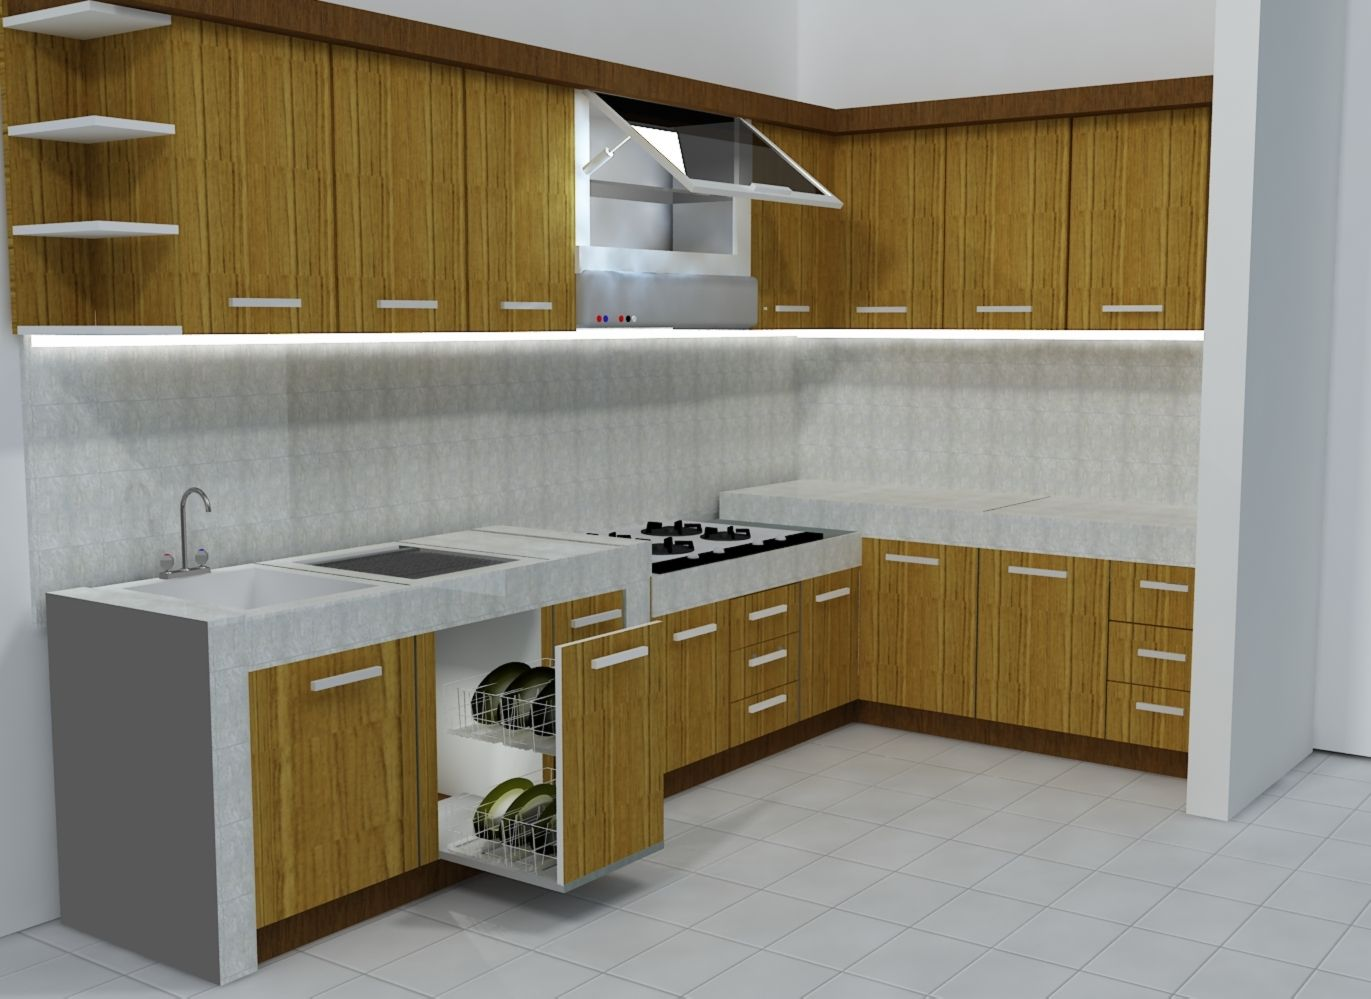 Harga 70 Model Gambar Kitchen Set Minimalis Model Dapur Ruang Keluarga Minimalis Lemari Dapur